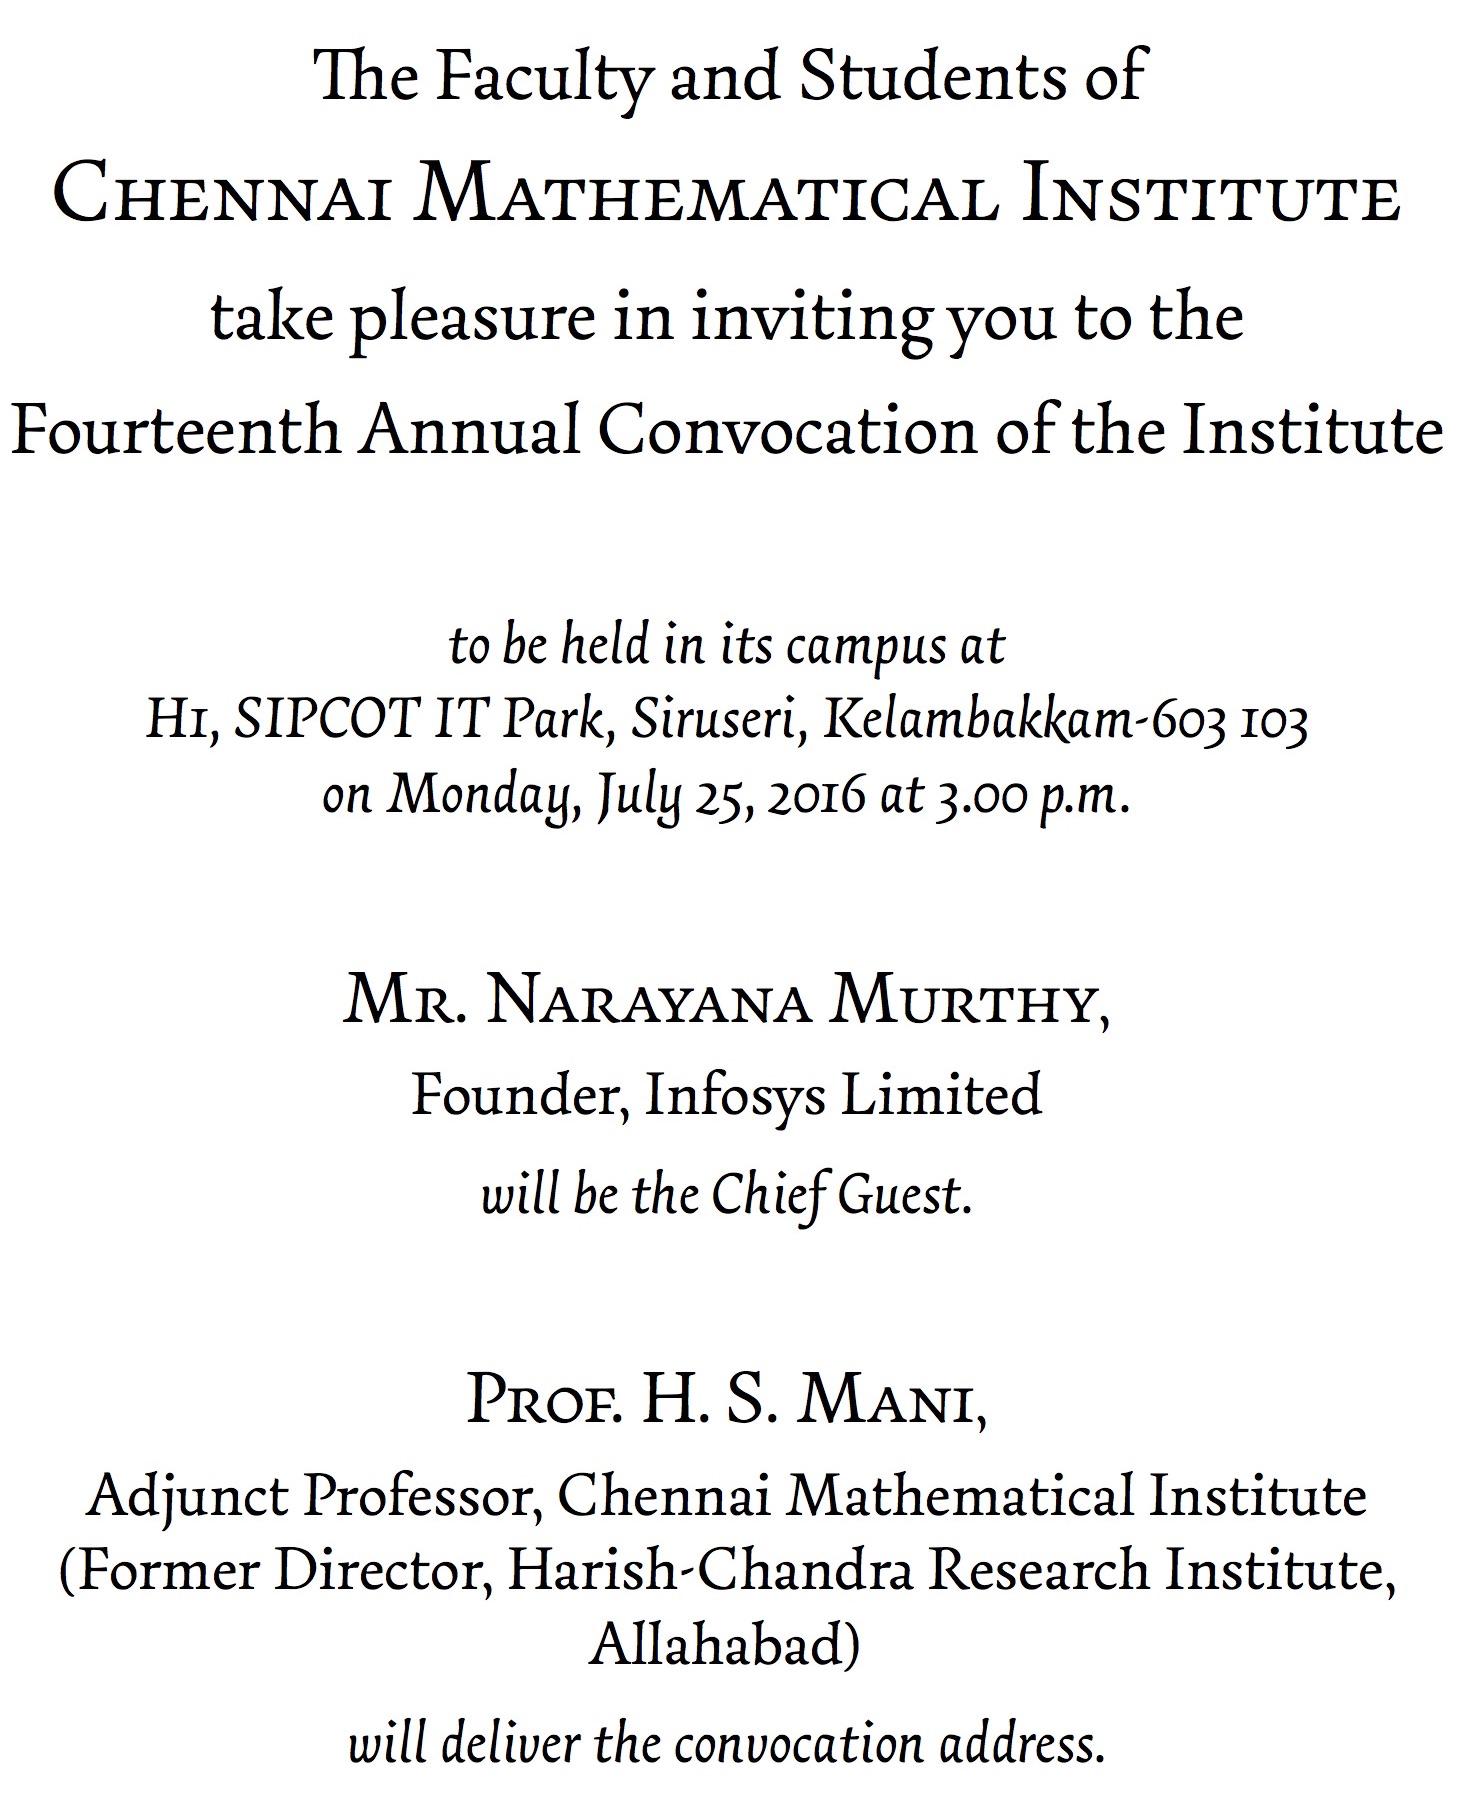 https://www.cmi.ac.in//events/convocation/2016/invitation-2016.txt